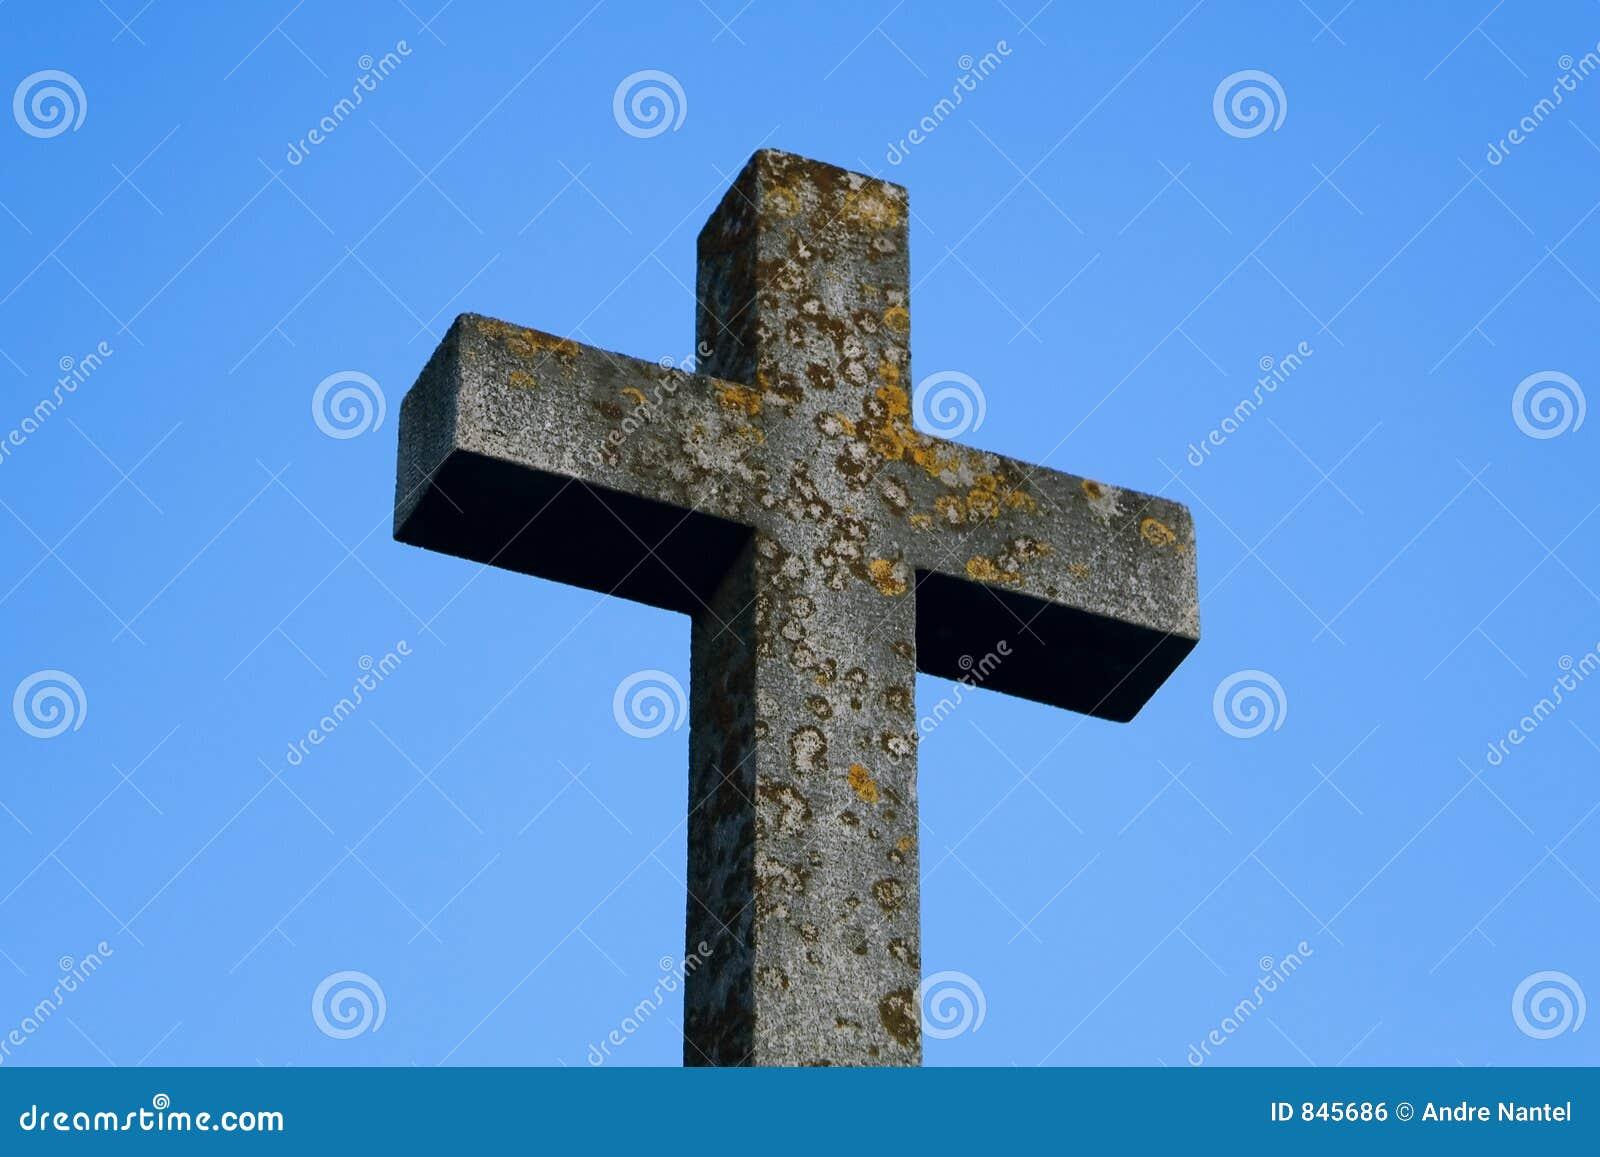 Stone Cross under Blue Sky